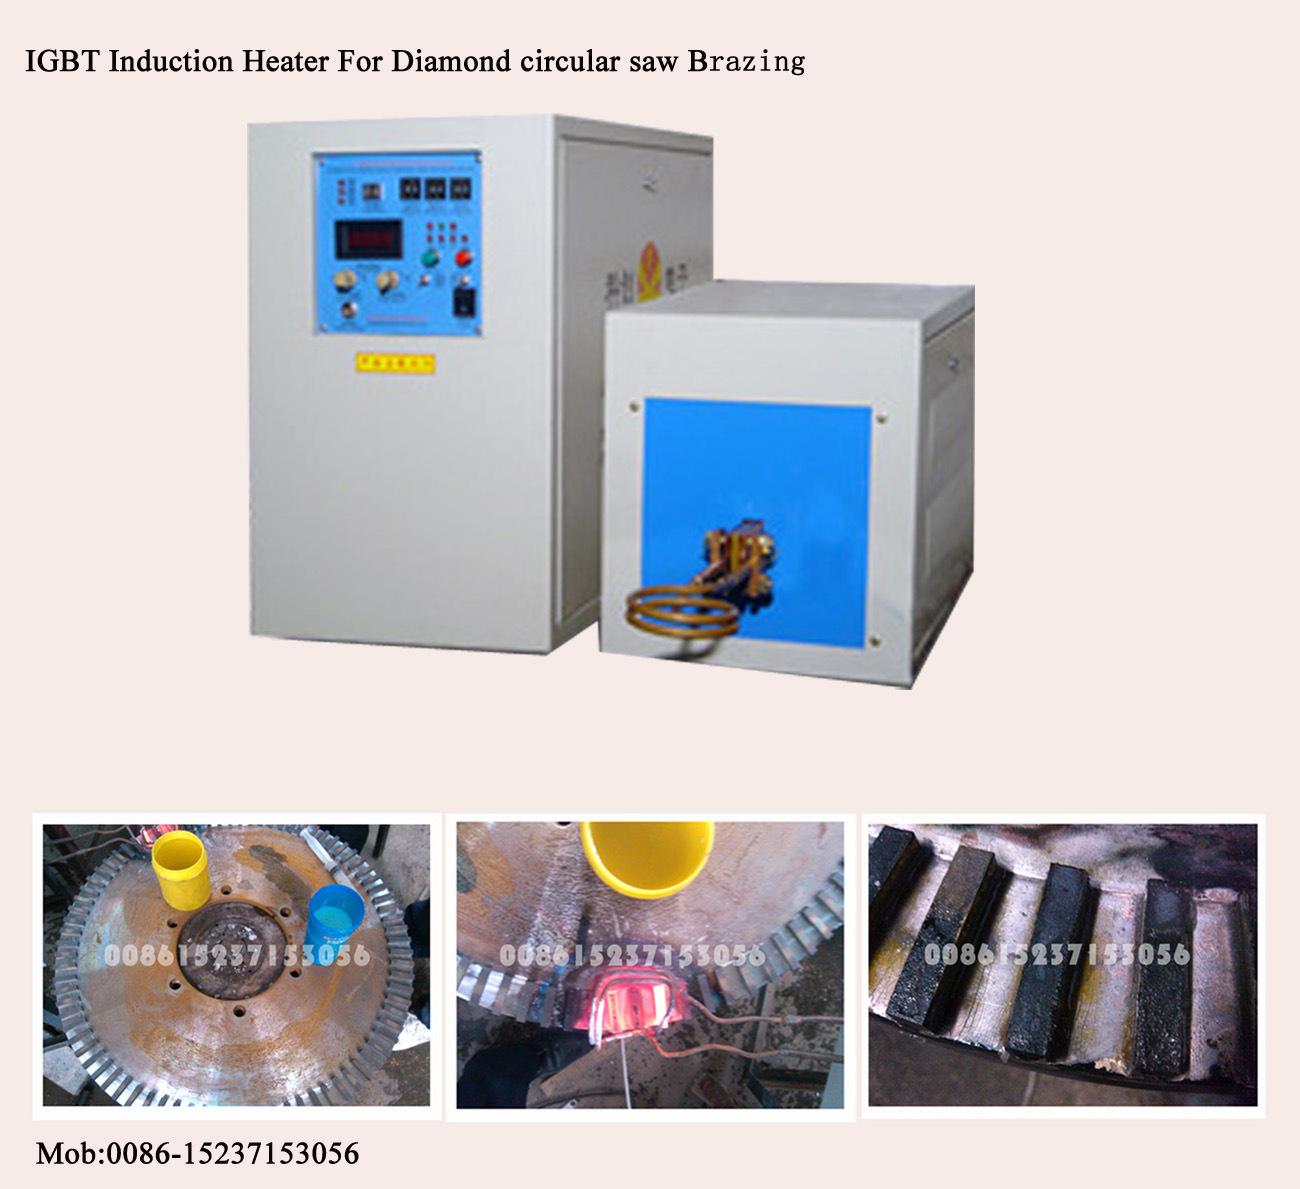 China Igbt Induction Heater For Diamond Circular Saw Brazing Furnace Circuit Heating Iii With Welding